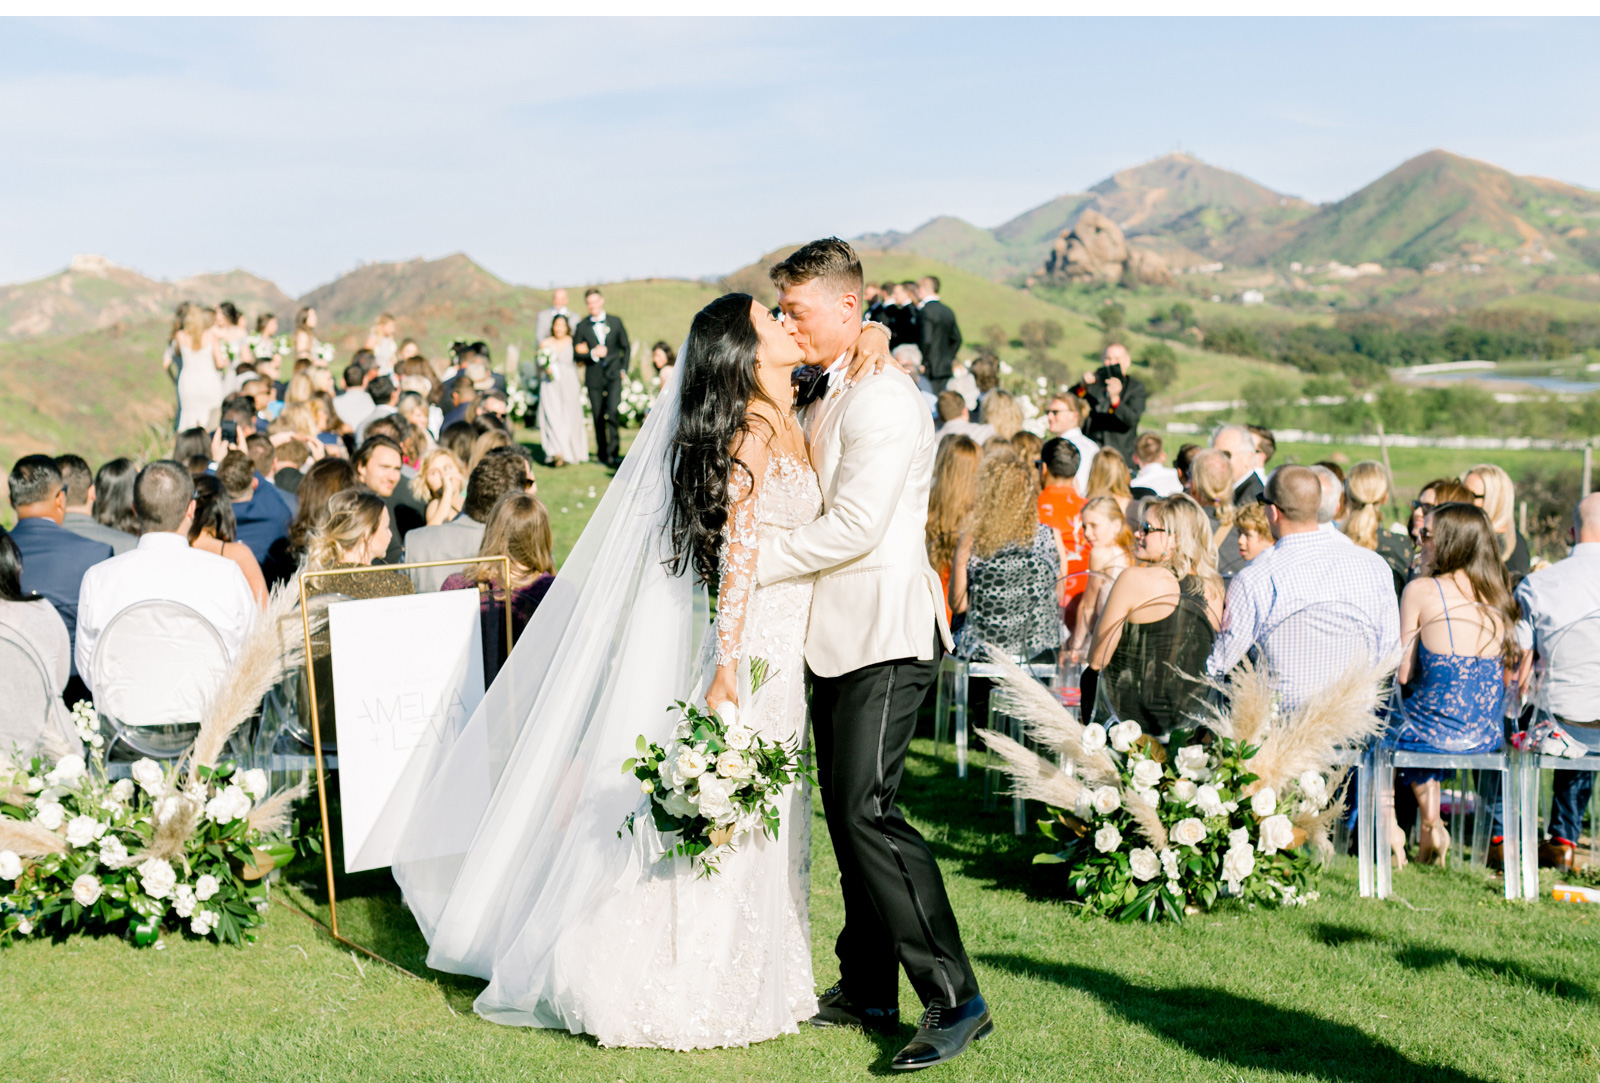 Malibu-Wedding-Venue-Photographer-Southern-California-Fine-Art-Wedding-Photo-Style-Me-Pretty-Natalie-Schutt-Photography_03.jpg